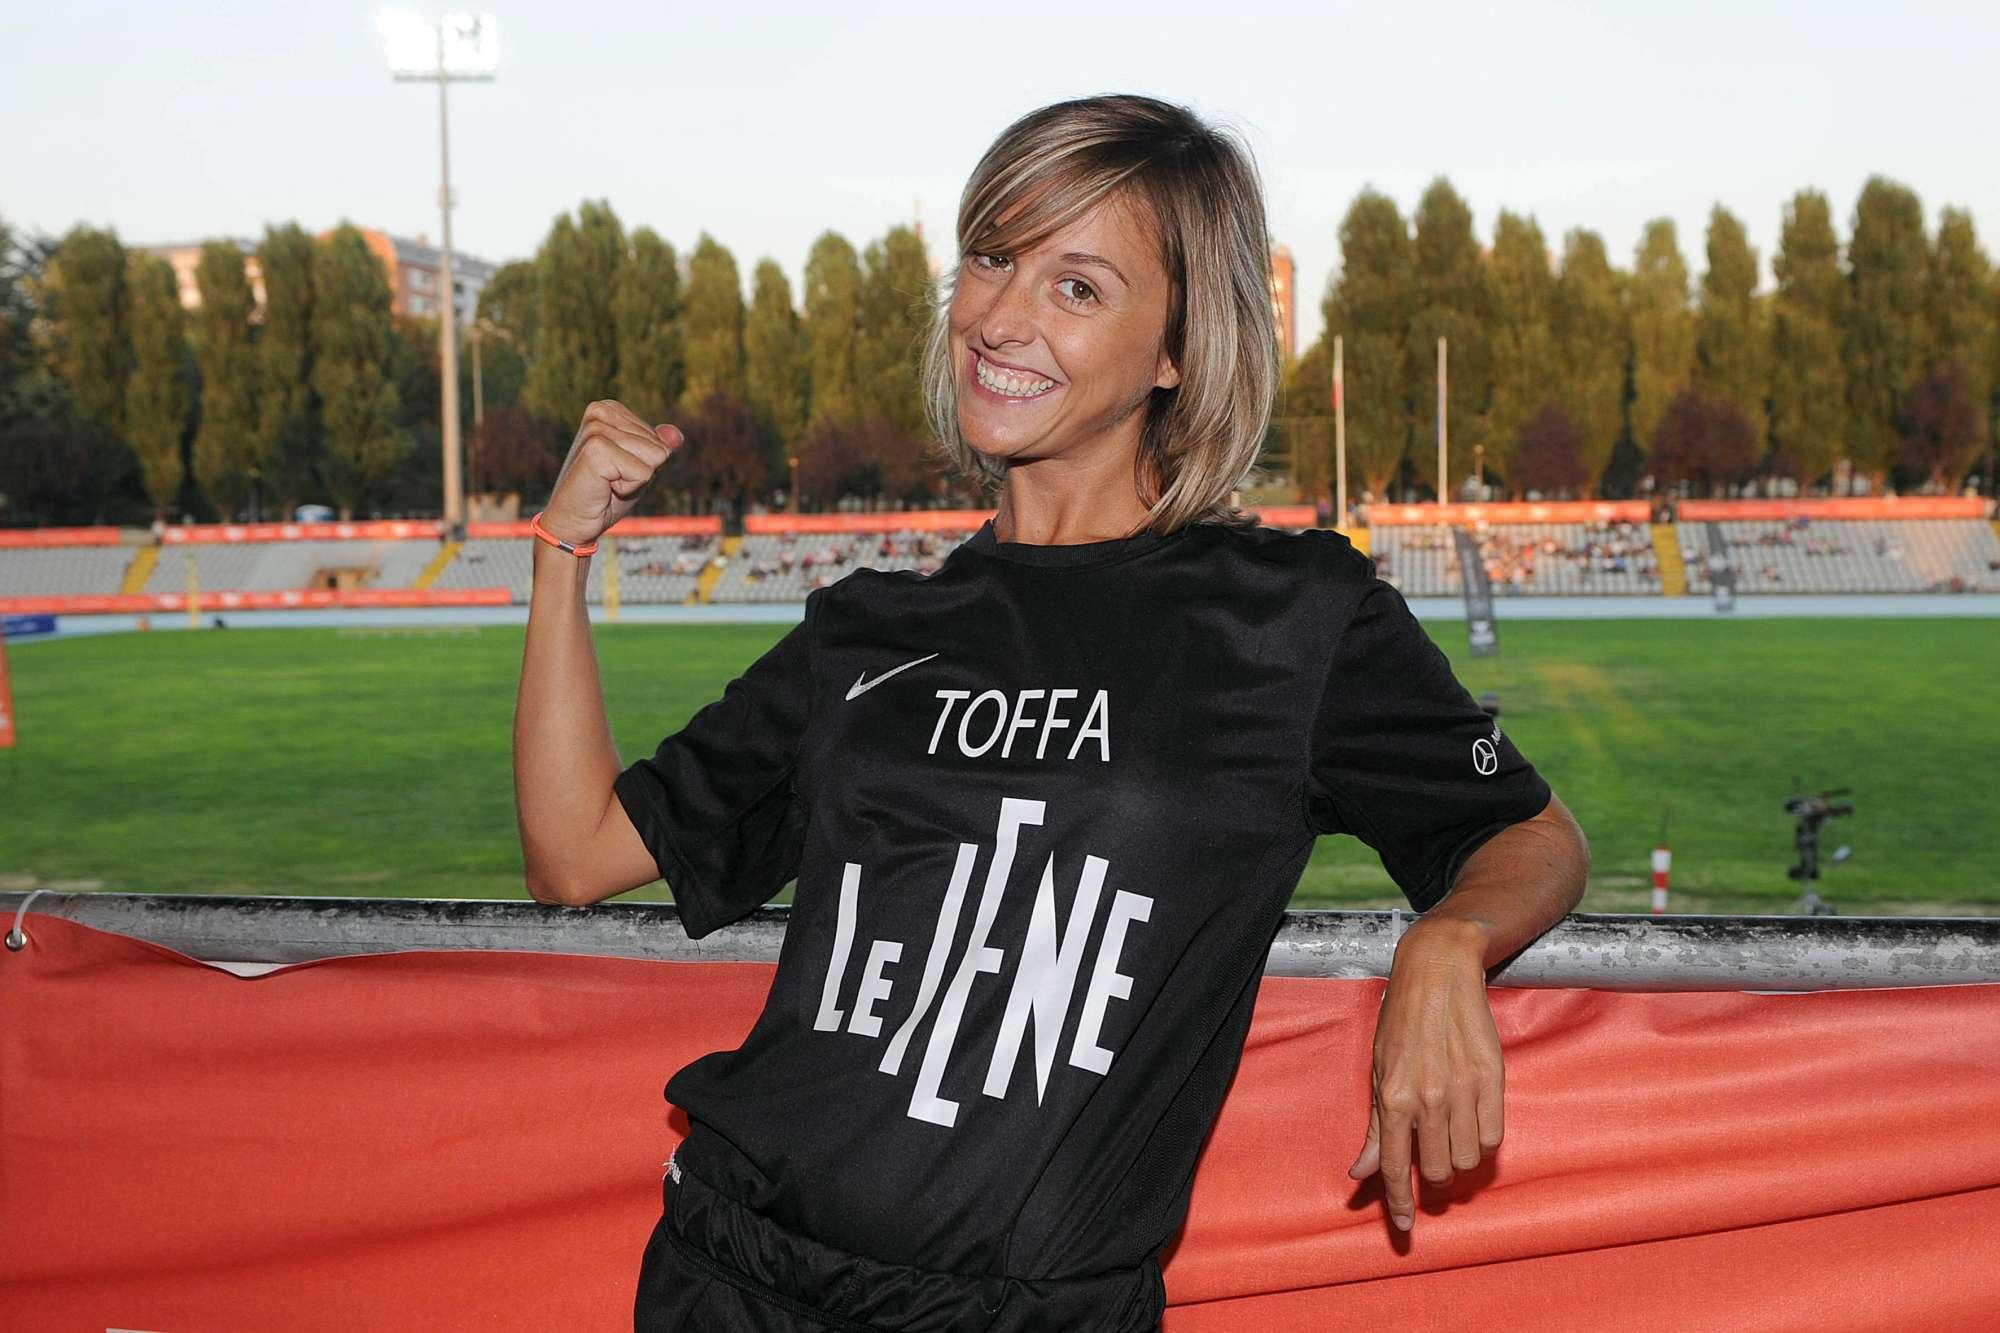 Nadia Toffa, le foto della Iena guerriera